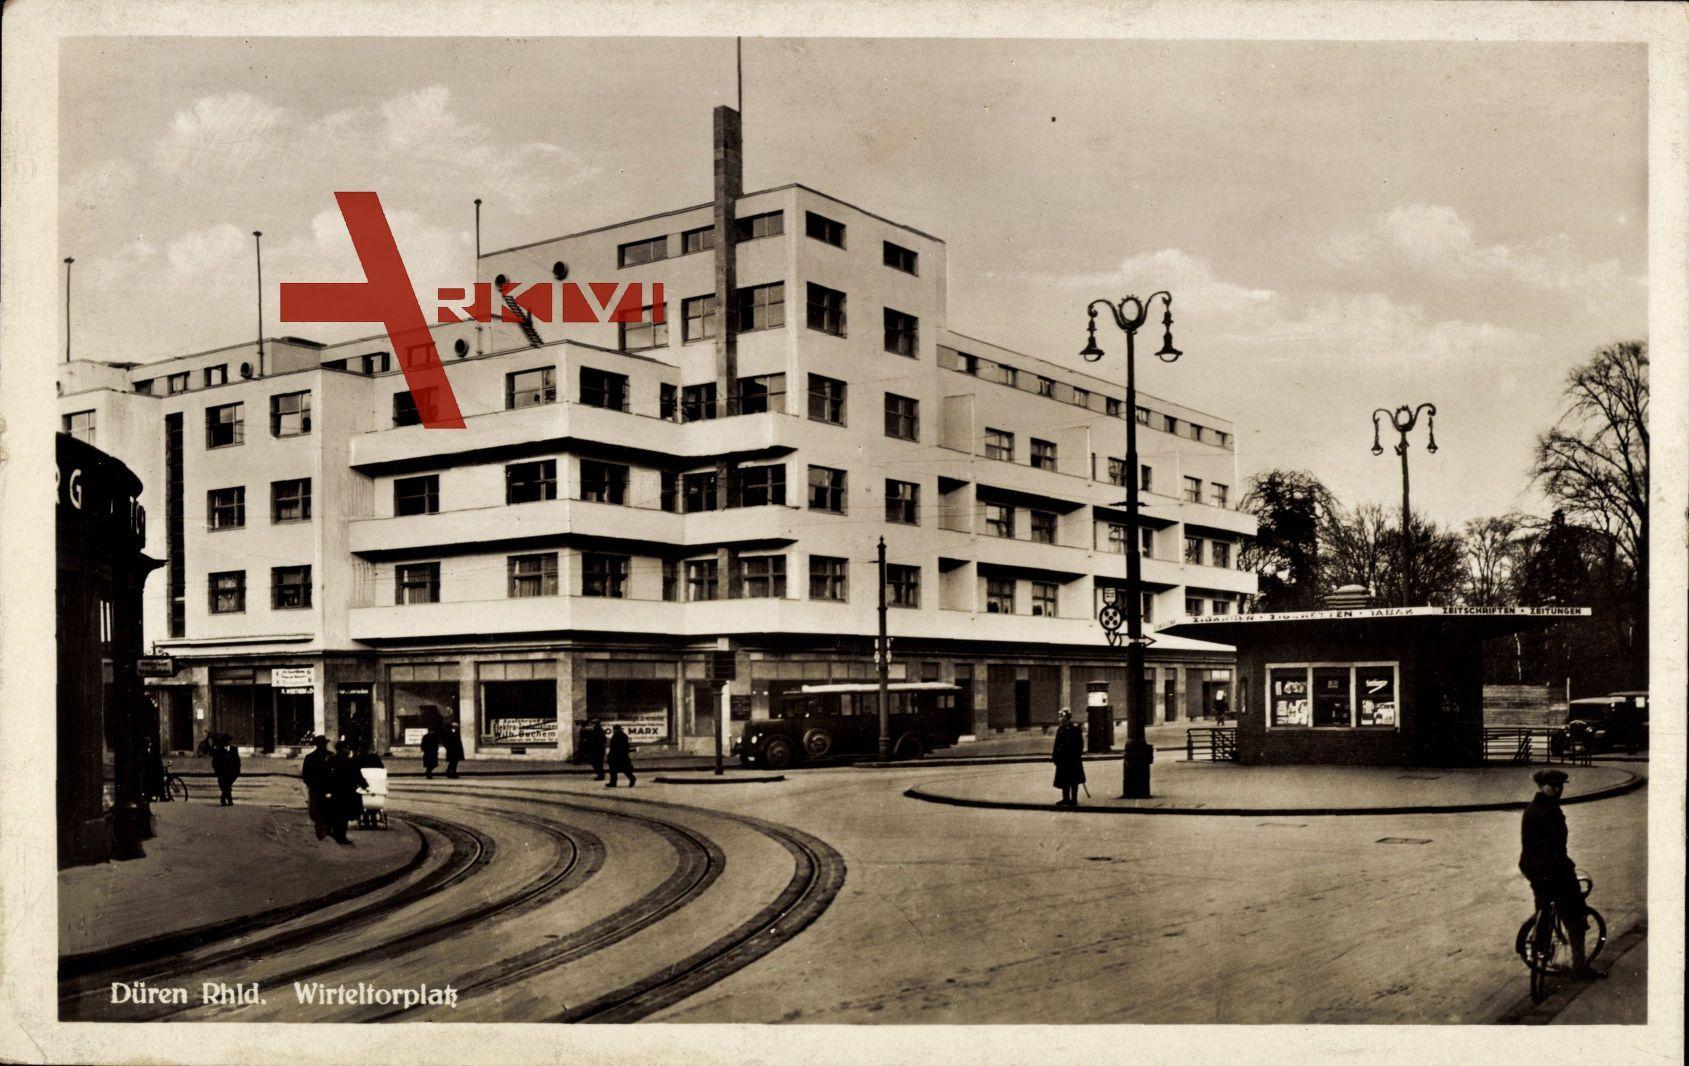 Düren, Blick auf den Wirteltorplatz, Tramschienen, Passanten, Bauhaus